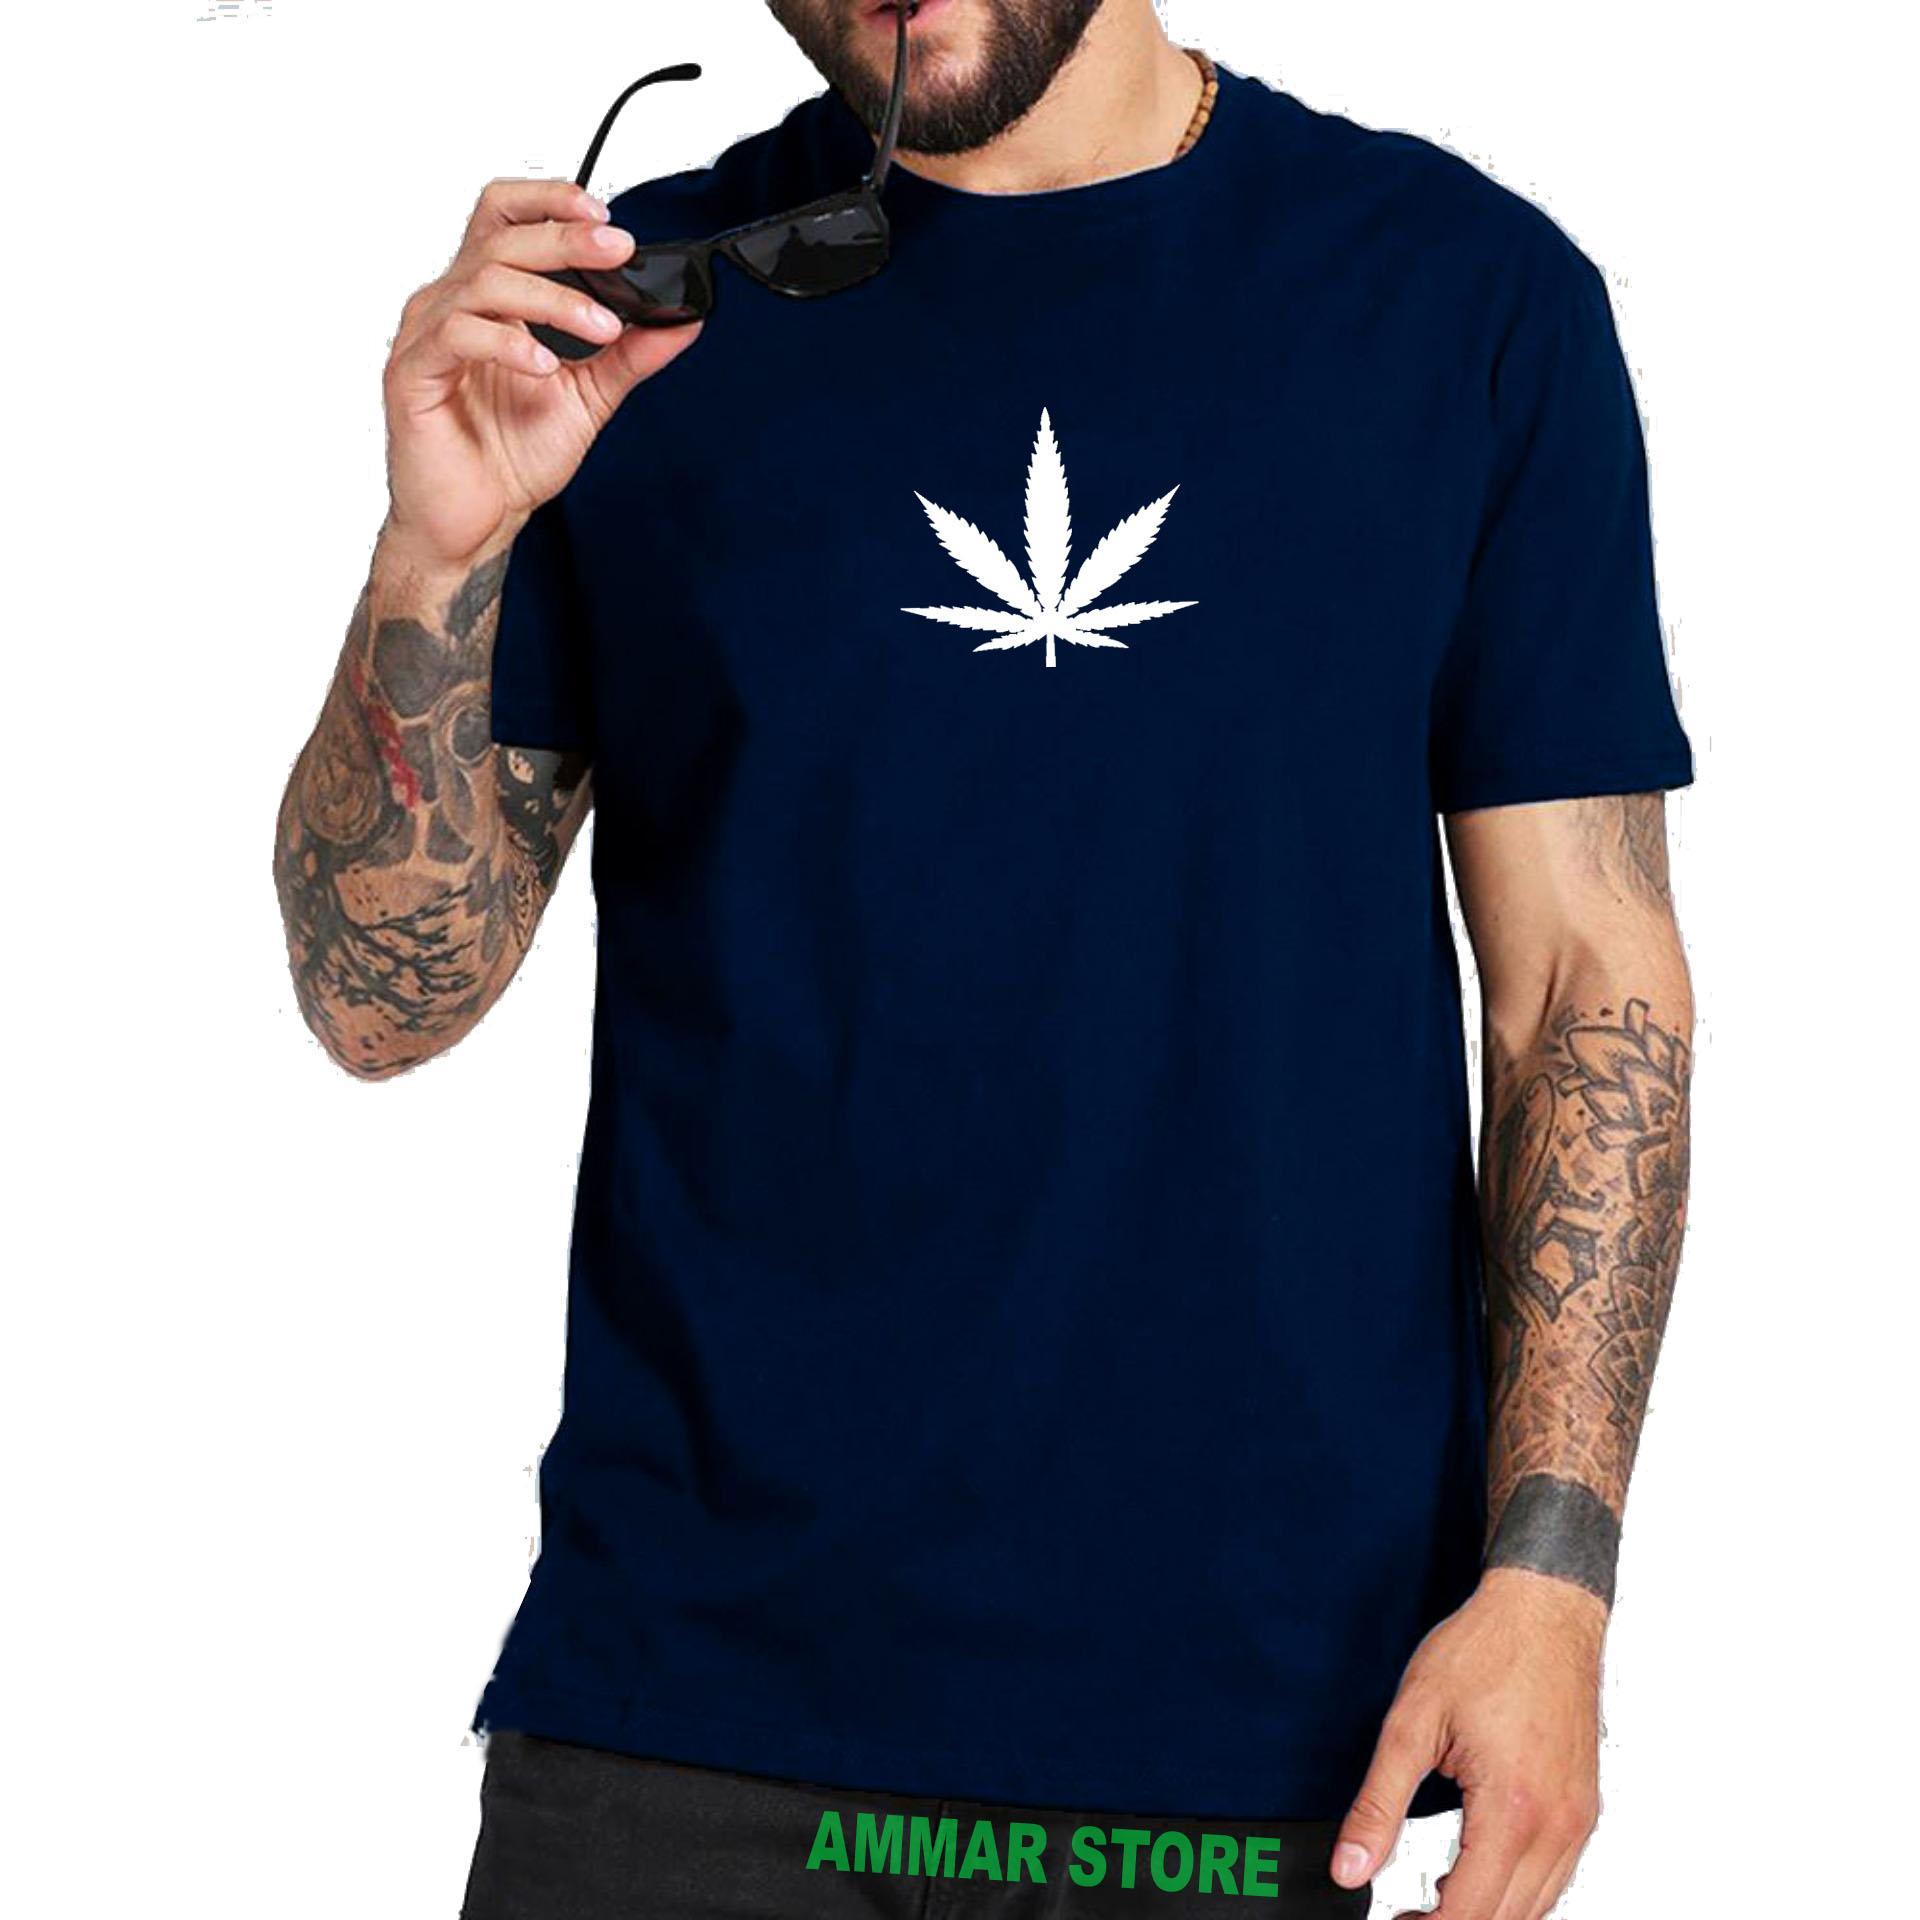 ammar store – kaos distro ganja kaos  / kaos terlaris / kaos  / fashion distro 100% soft cotton combed t-shirt